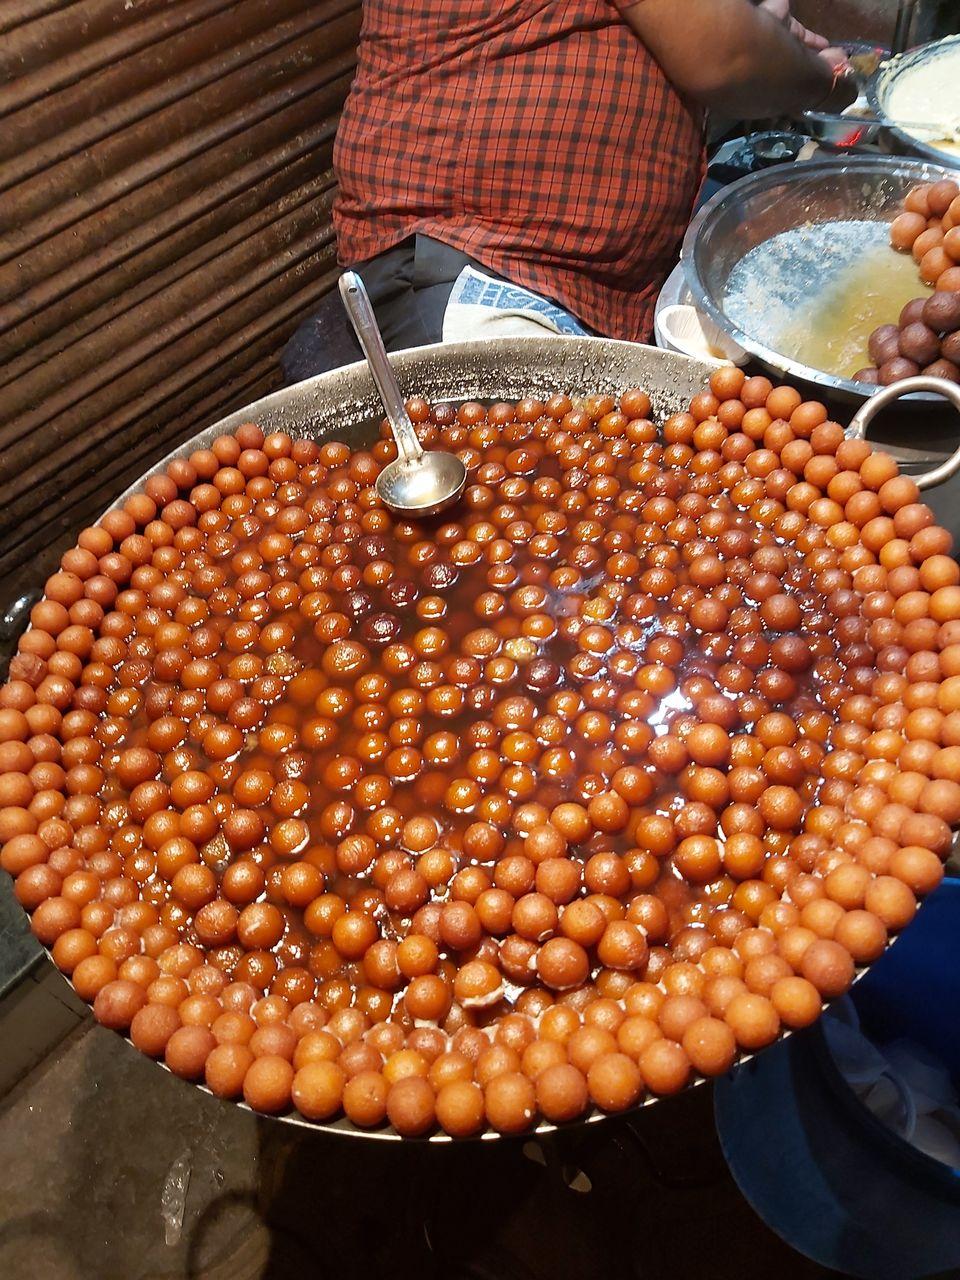 Photo of Sarafa Bazar, Indore, Madhya Pradesh, India by Rufina Shrotri